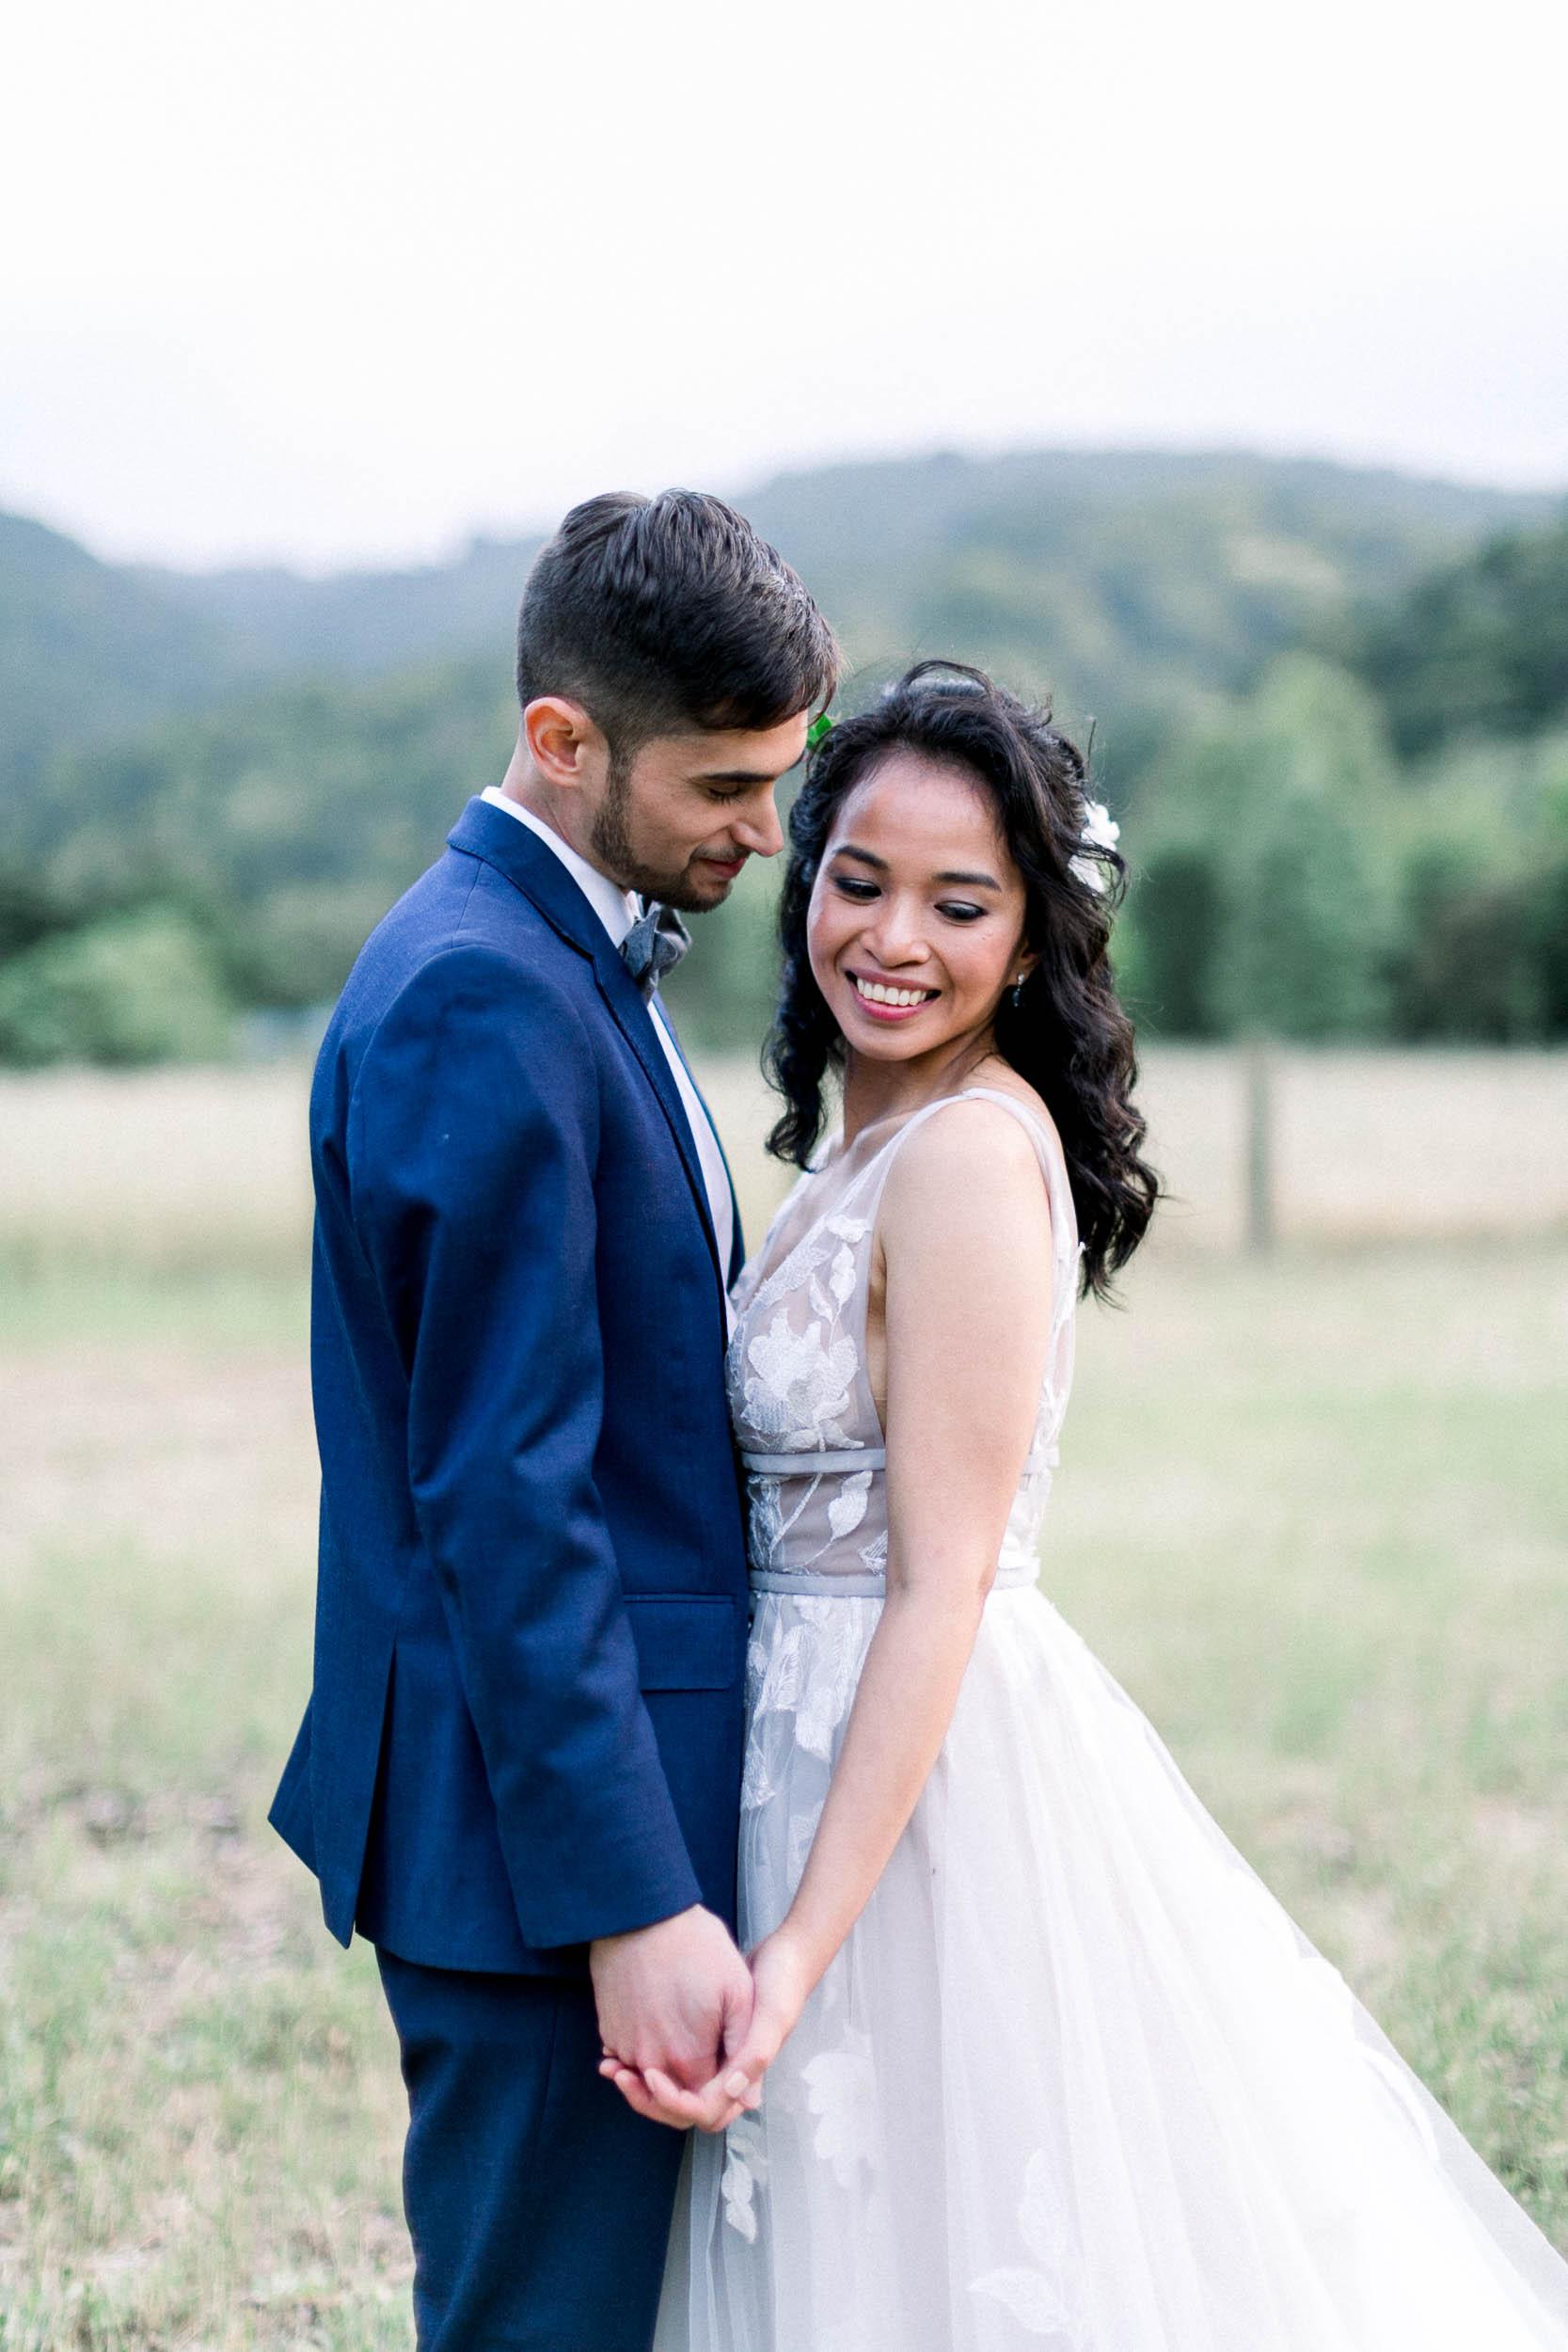 052519_B+S_Hidden Villa Wedding_Buena Lane Photography_052519_1066CY.jpg